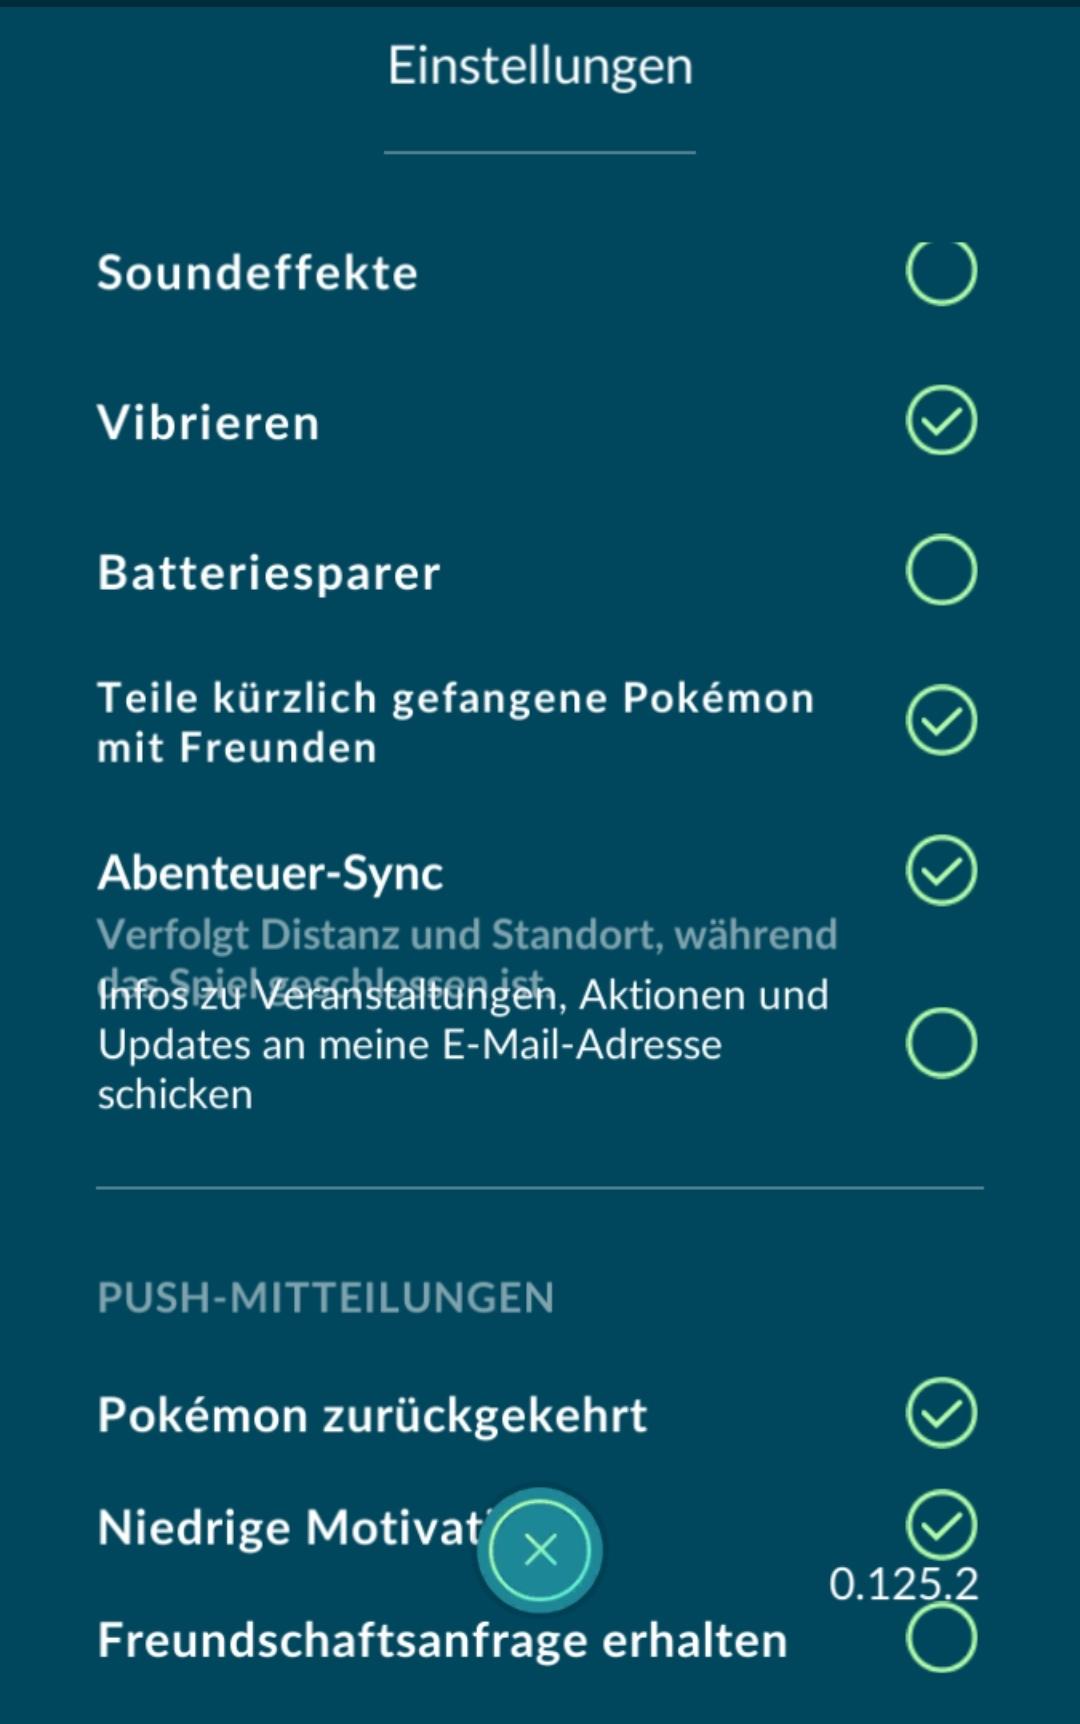 Abenteuer-Sync